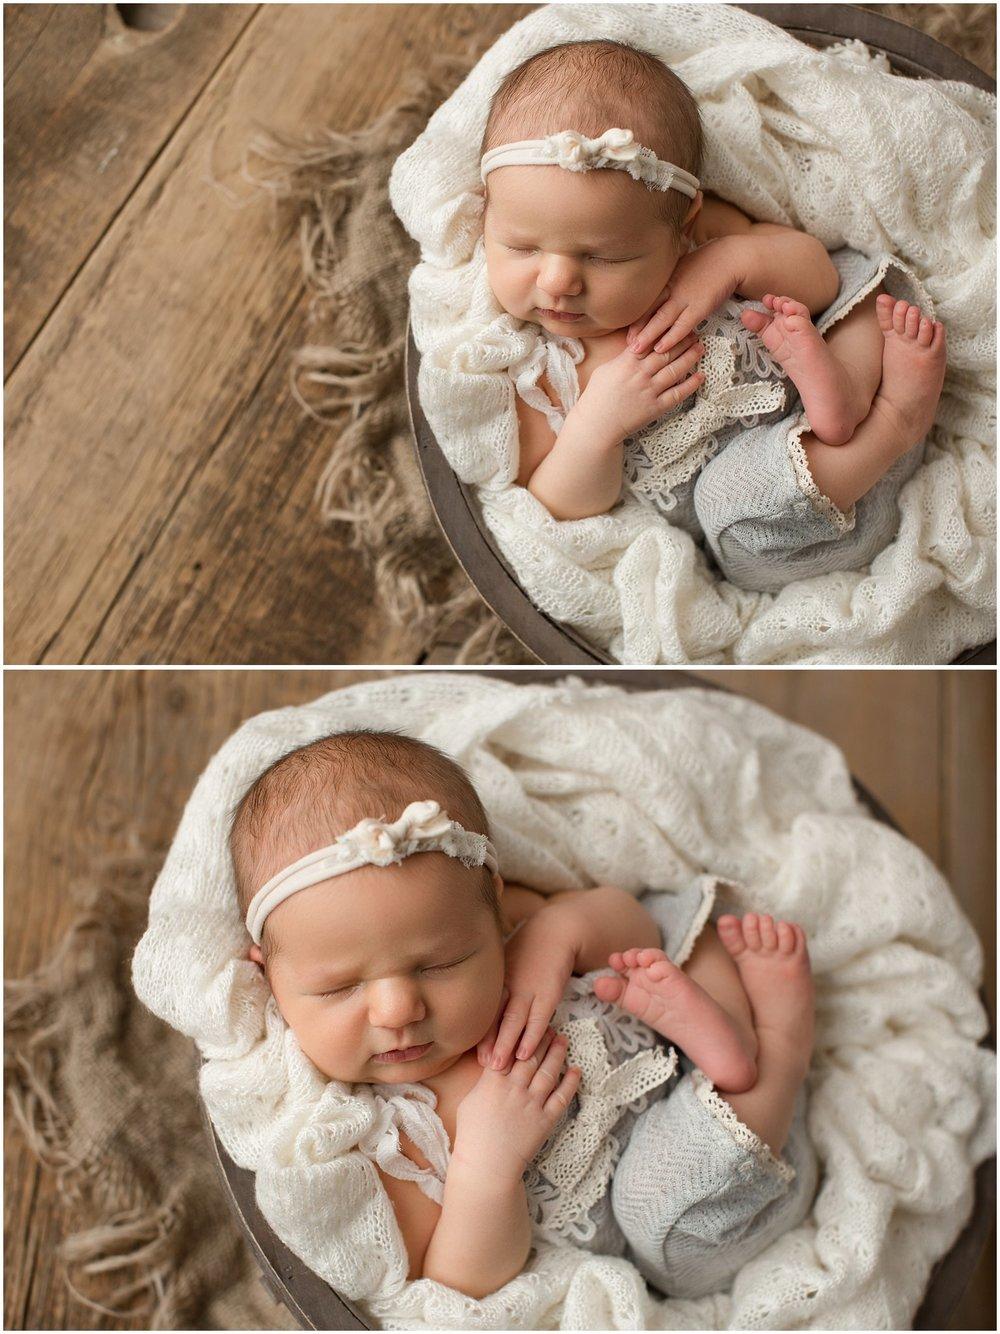 newborn girl wearing gray romper in a bowl